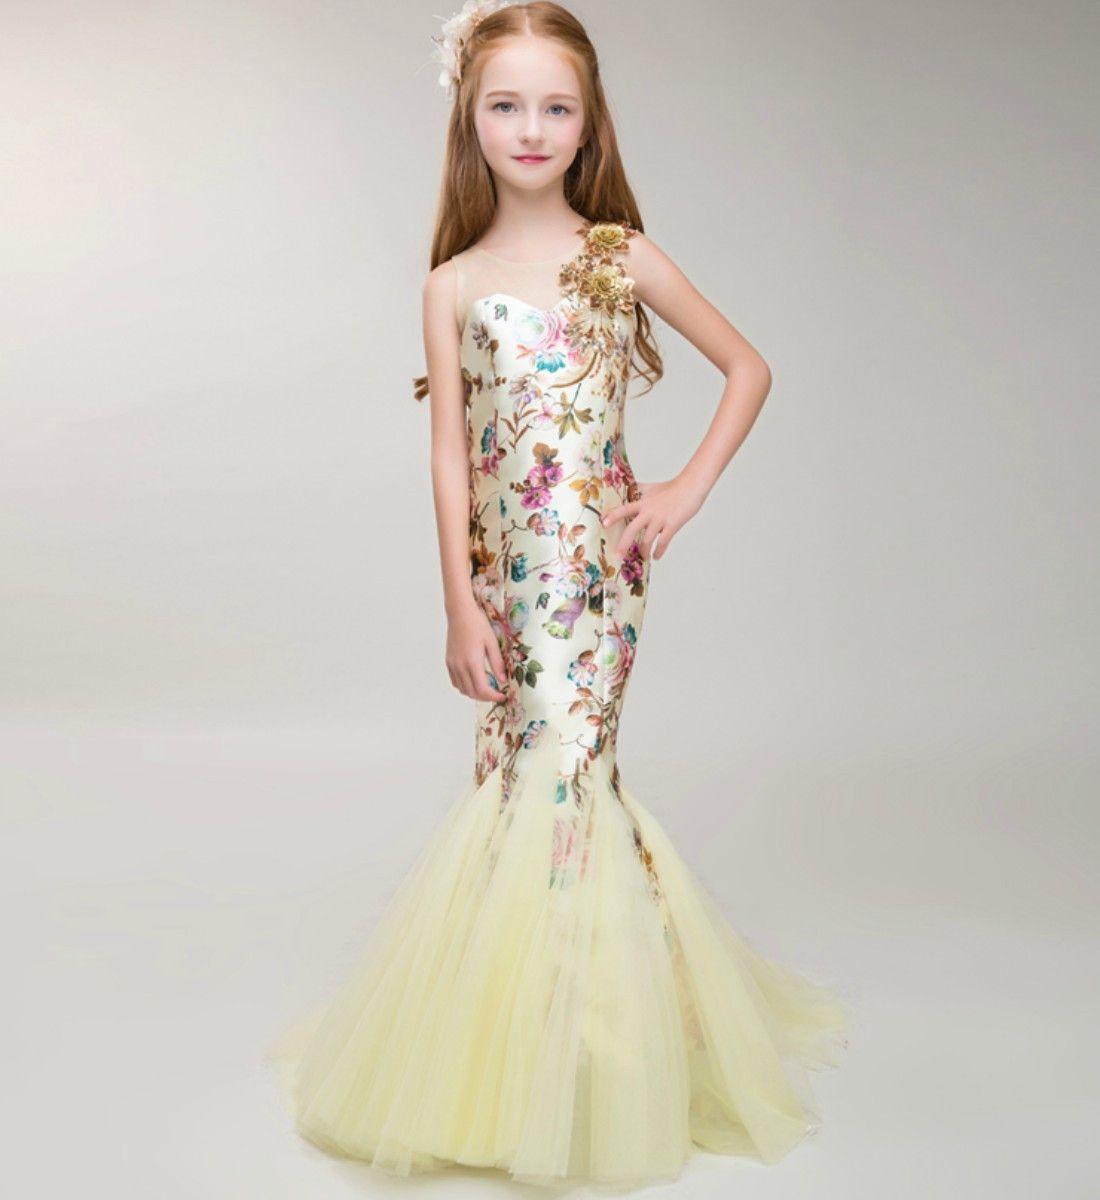 Mermaid Dress  Mermaid dress for kids, Wedding dresses for kids